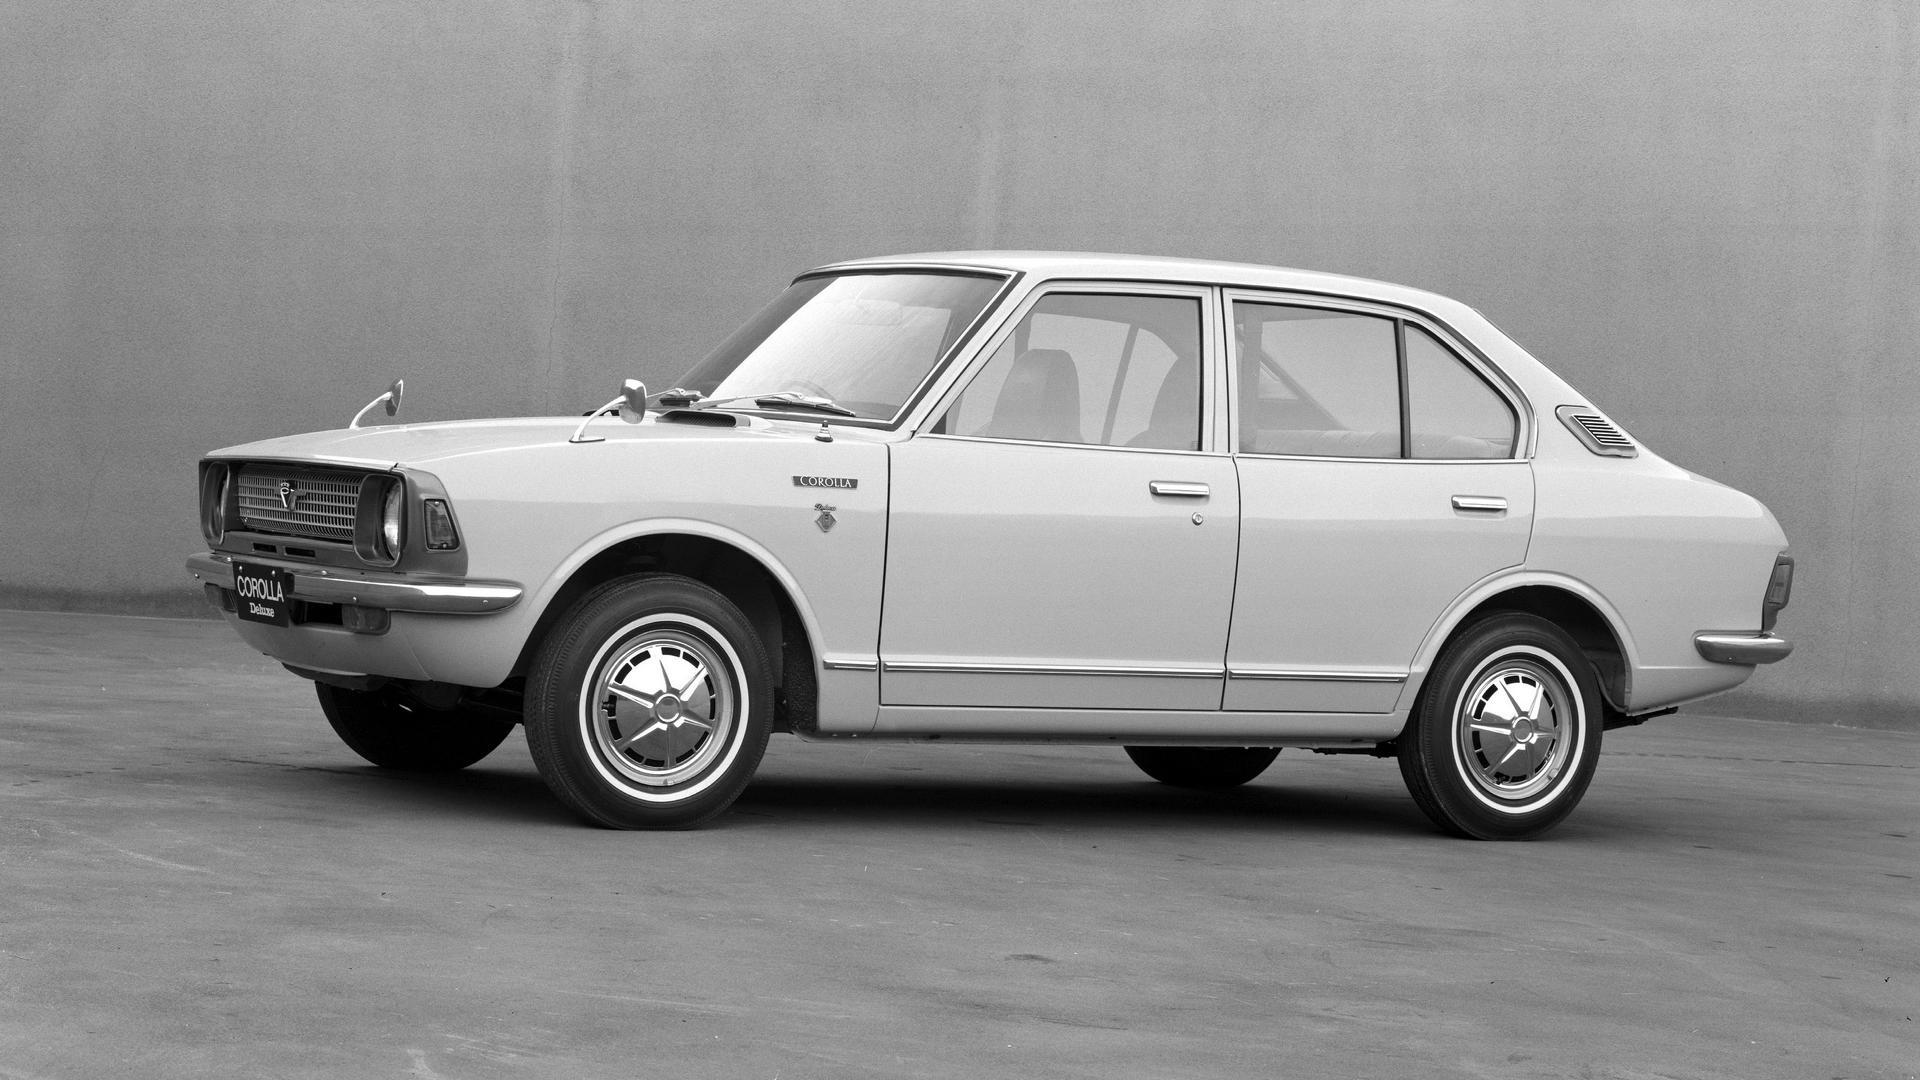 Kekurangan Toyota Corolla 1970 Spesifikasi